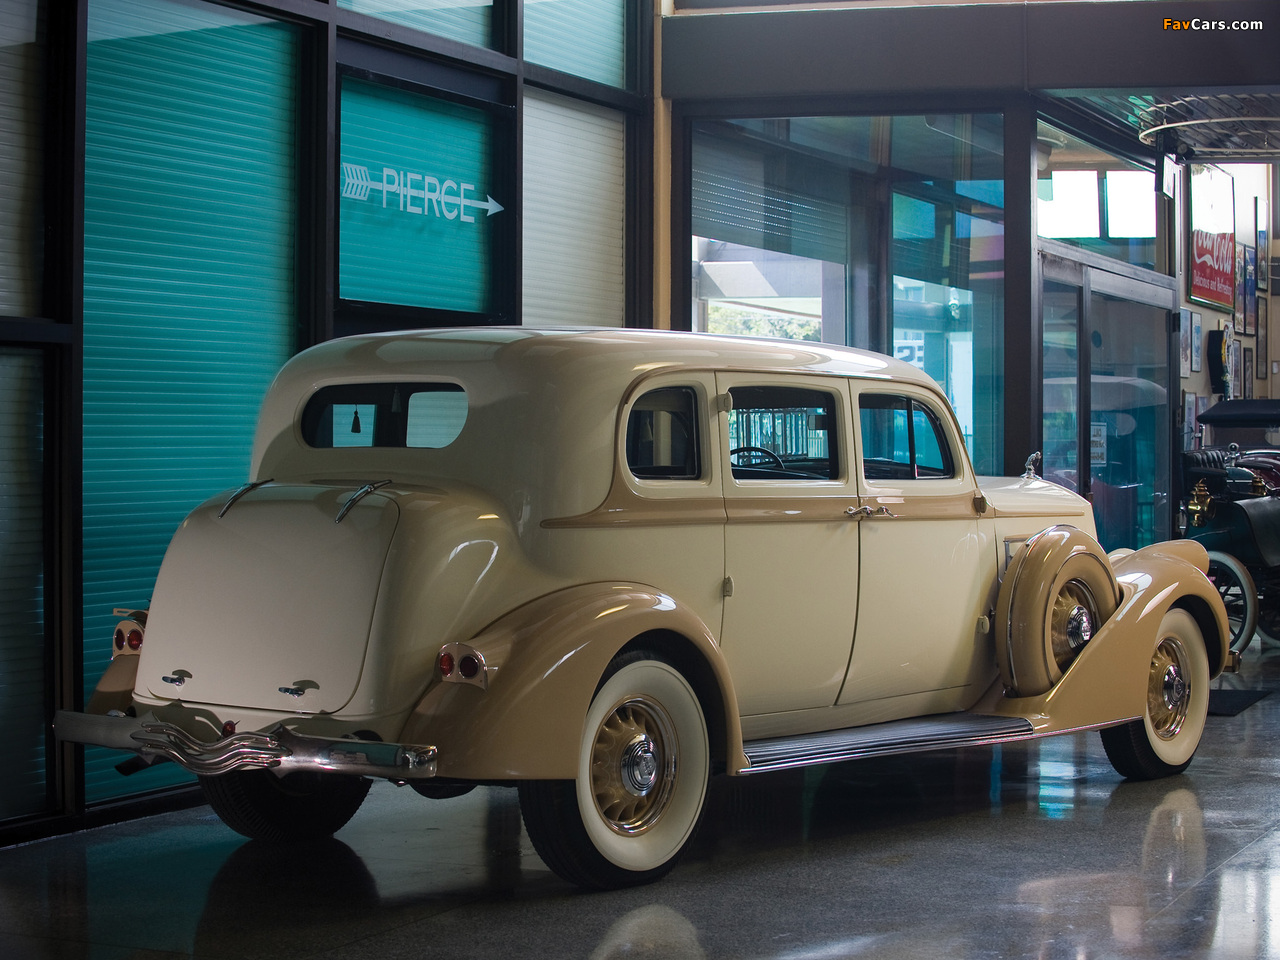 Pierce-Arrow Deluxe 8 Touring Sedan 1936 photos (1280 x 960)